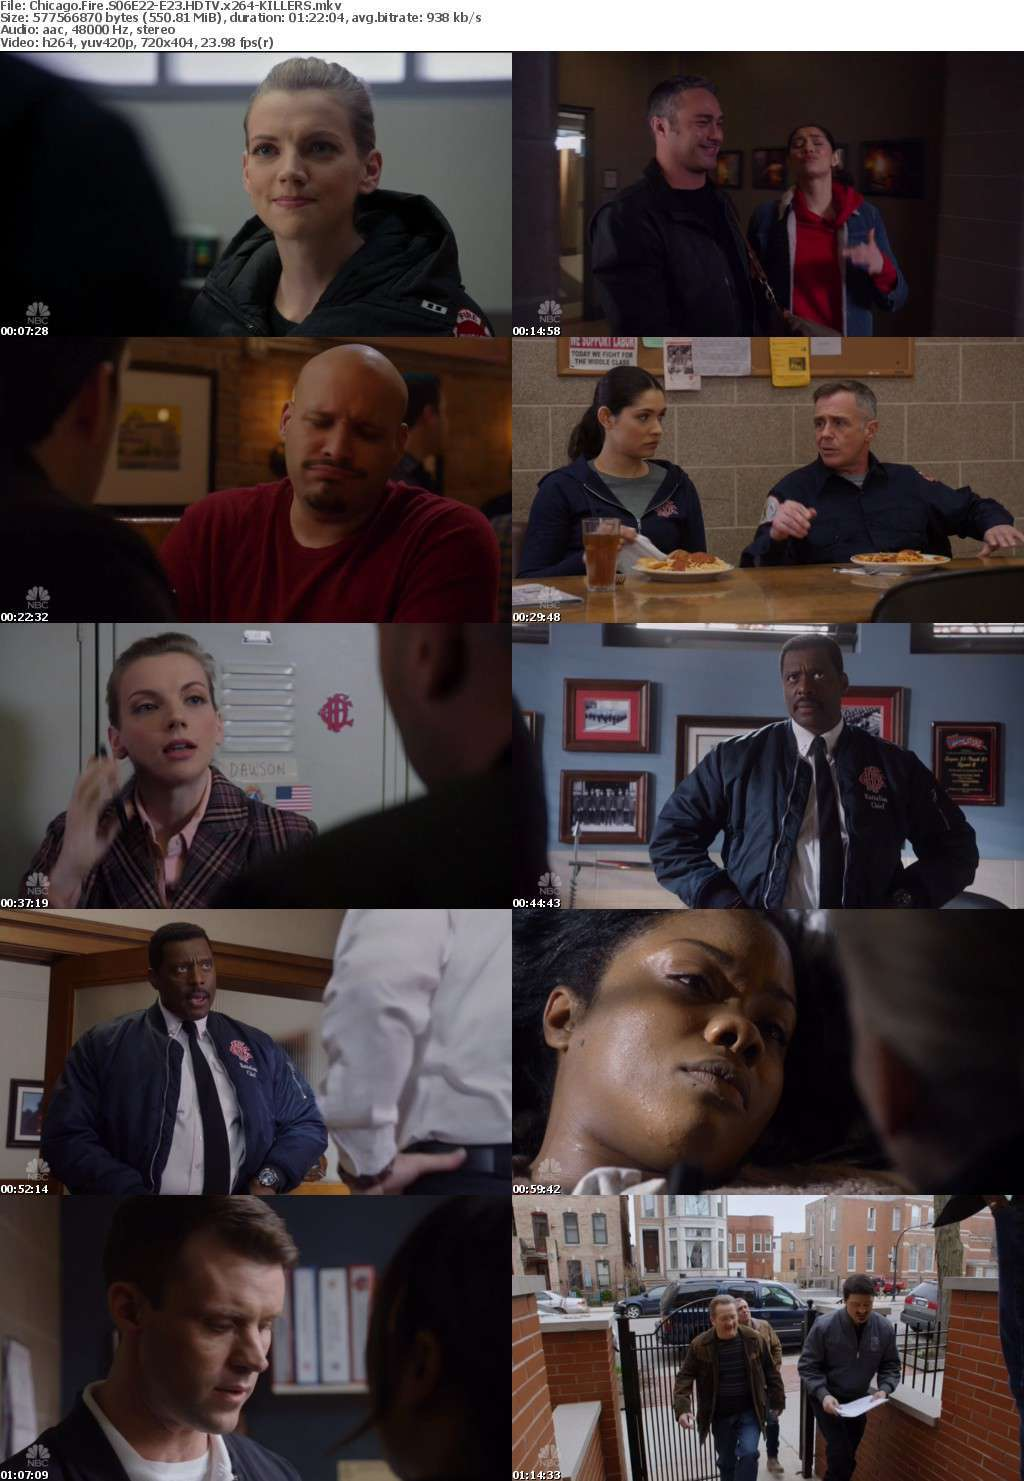 Chicago Fire S06E22-E23 HDTV x264-KILLERS